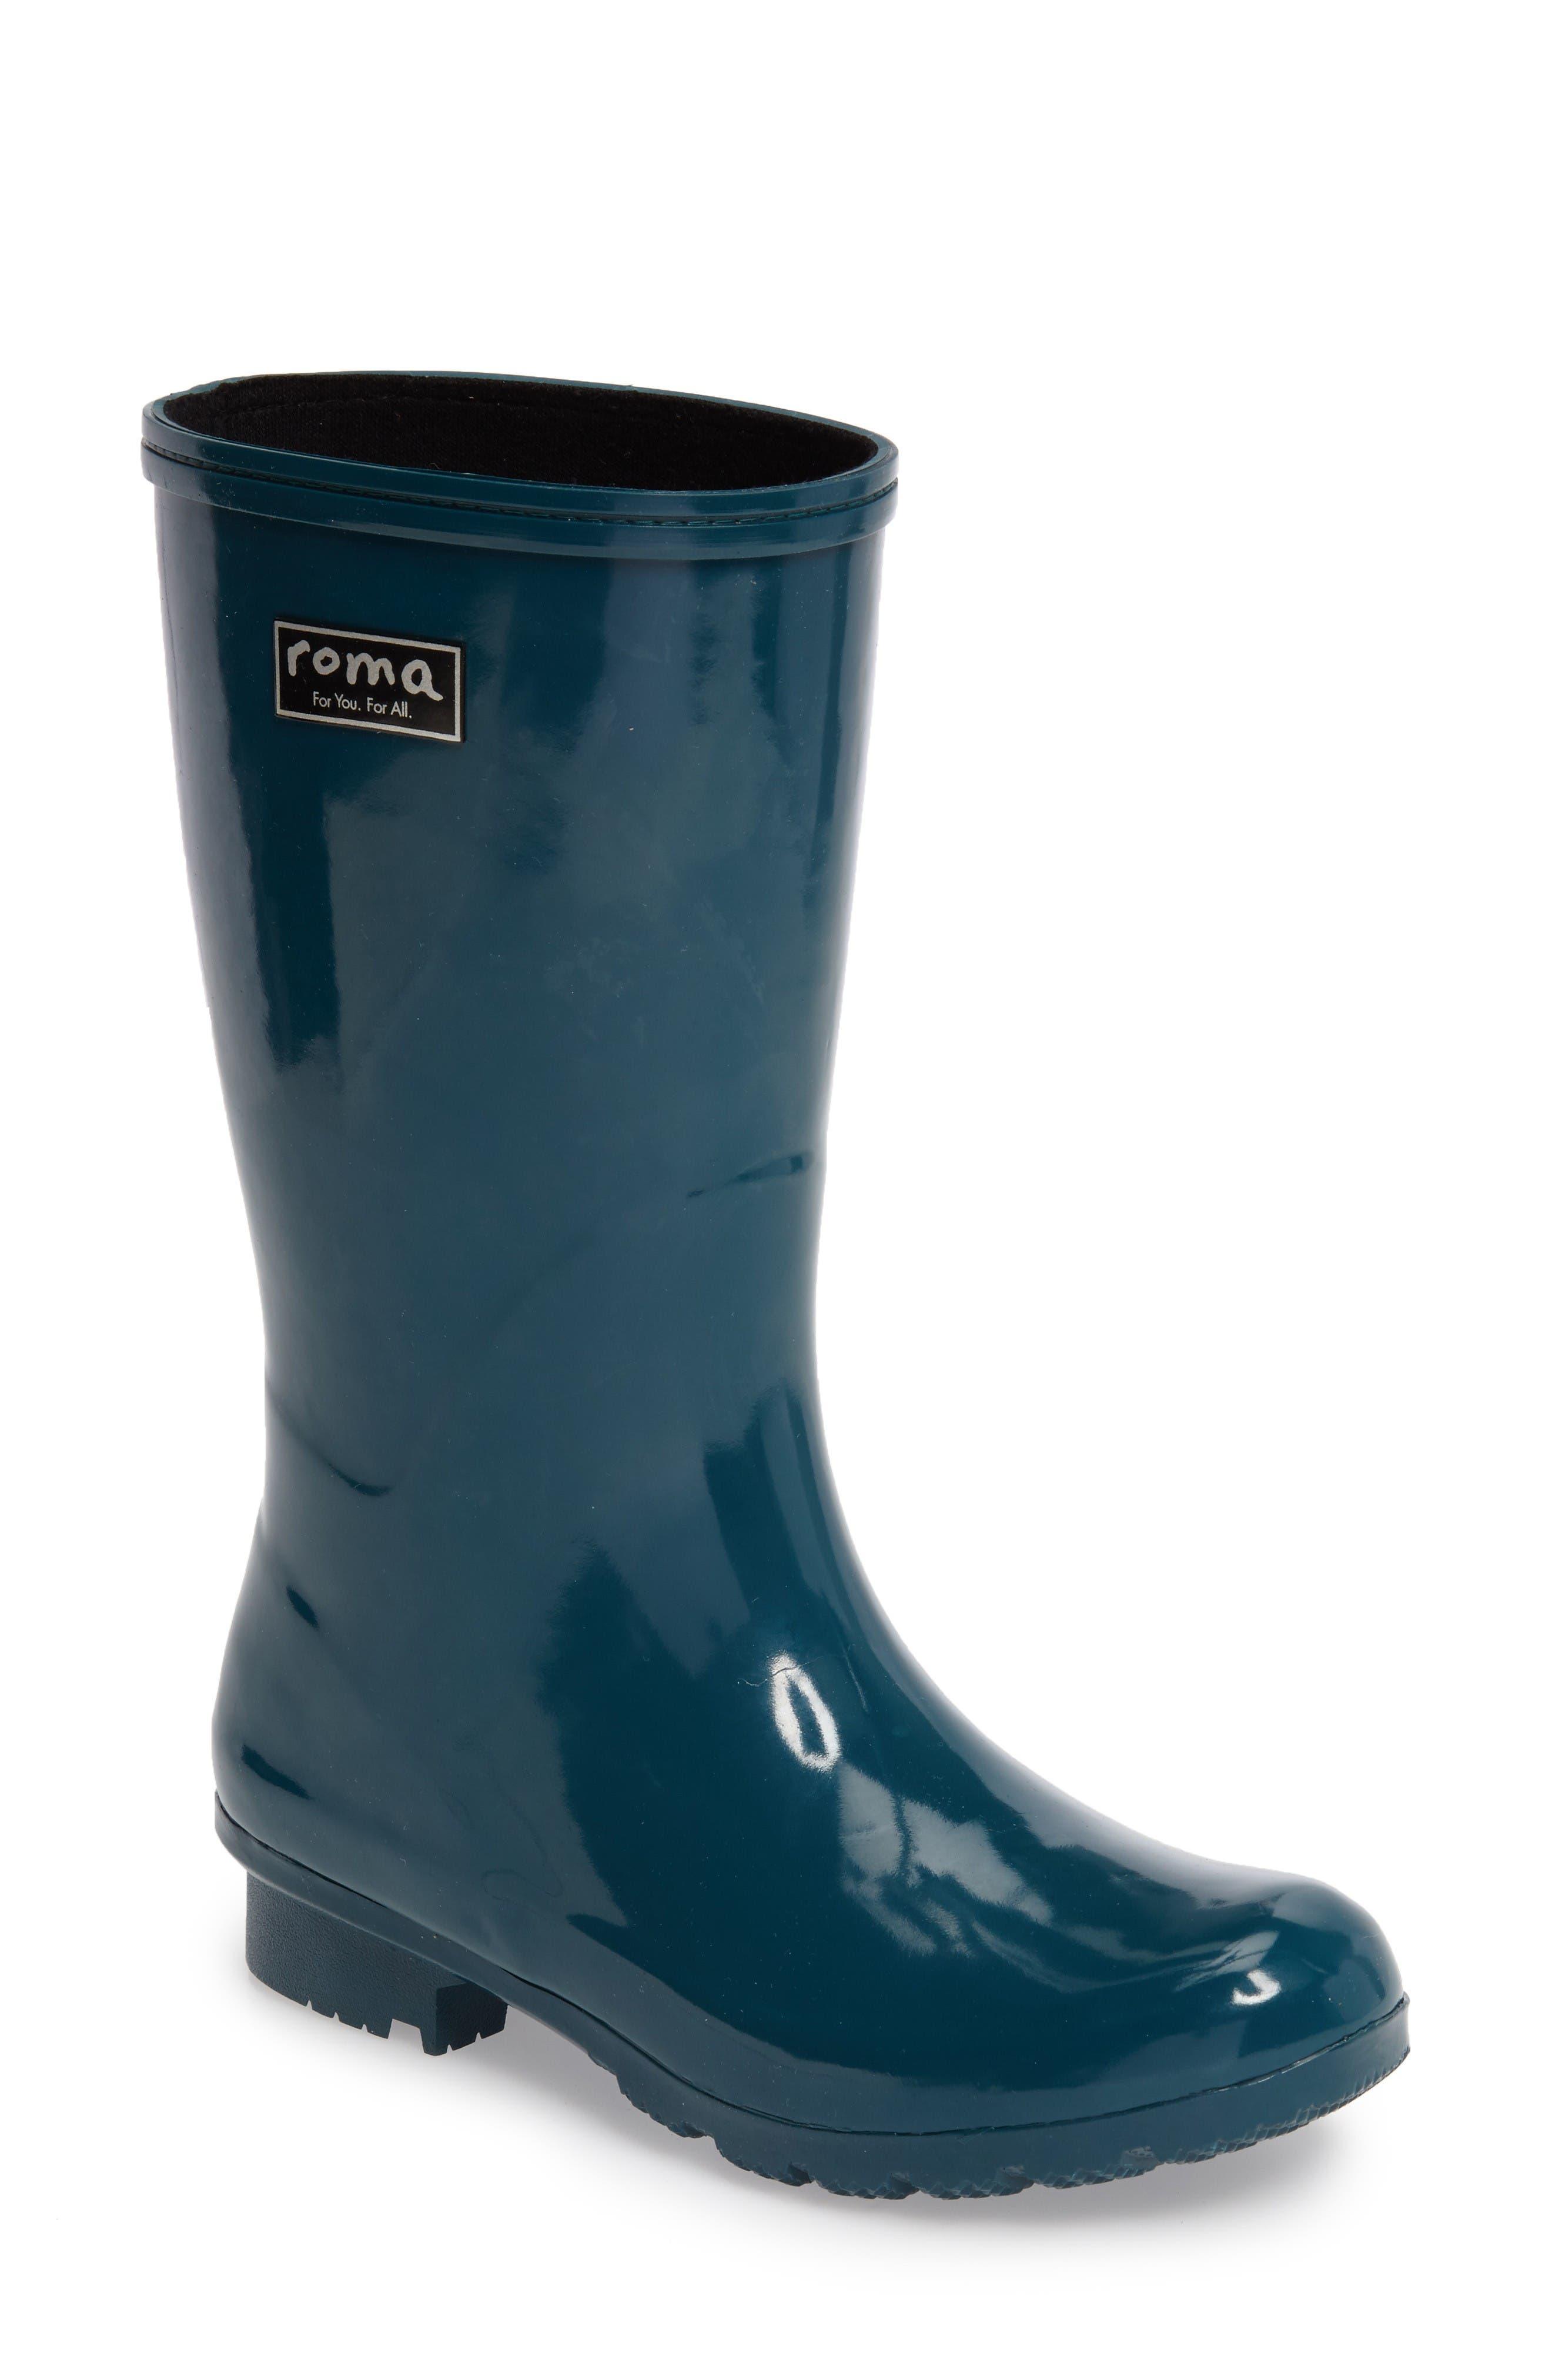 roma Short Rain Boot (Women)